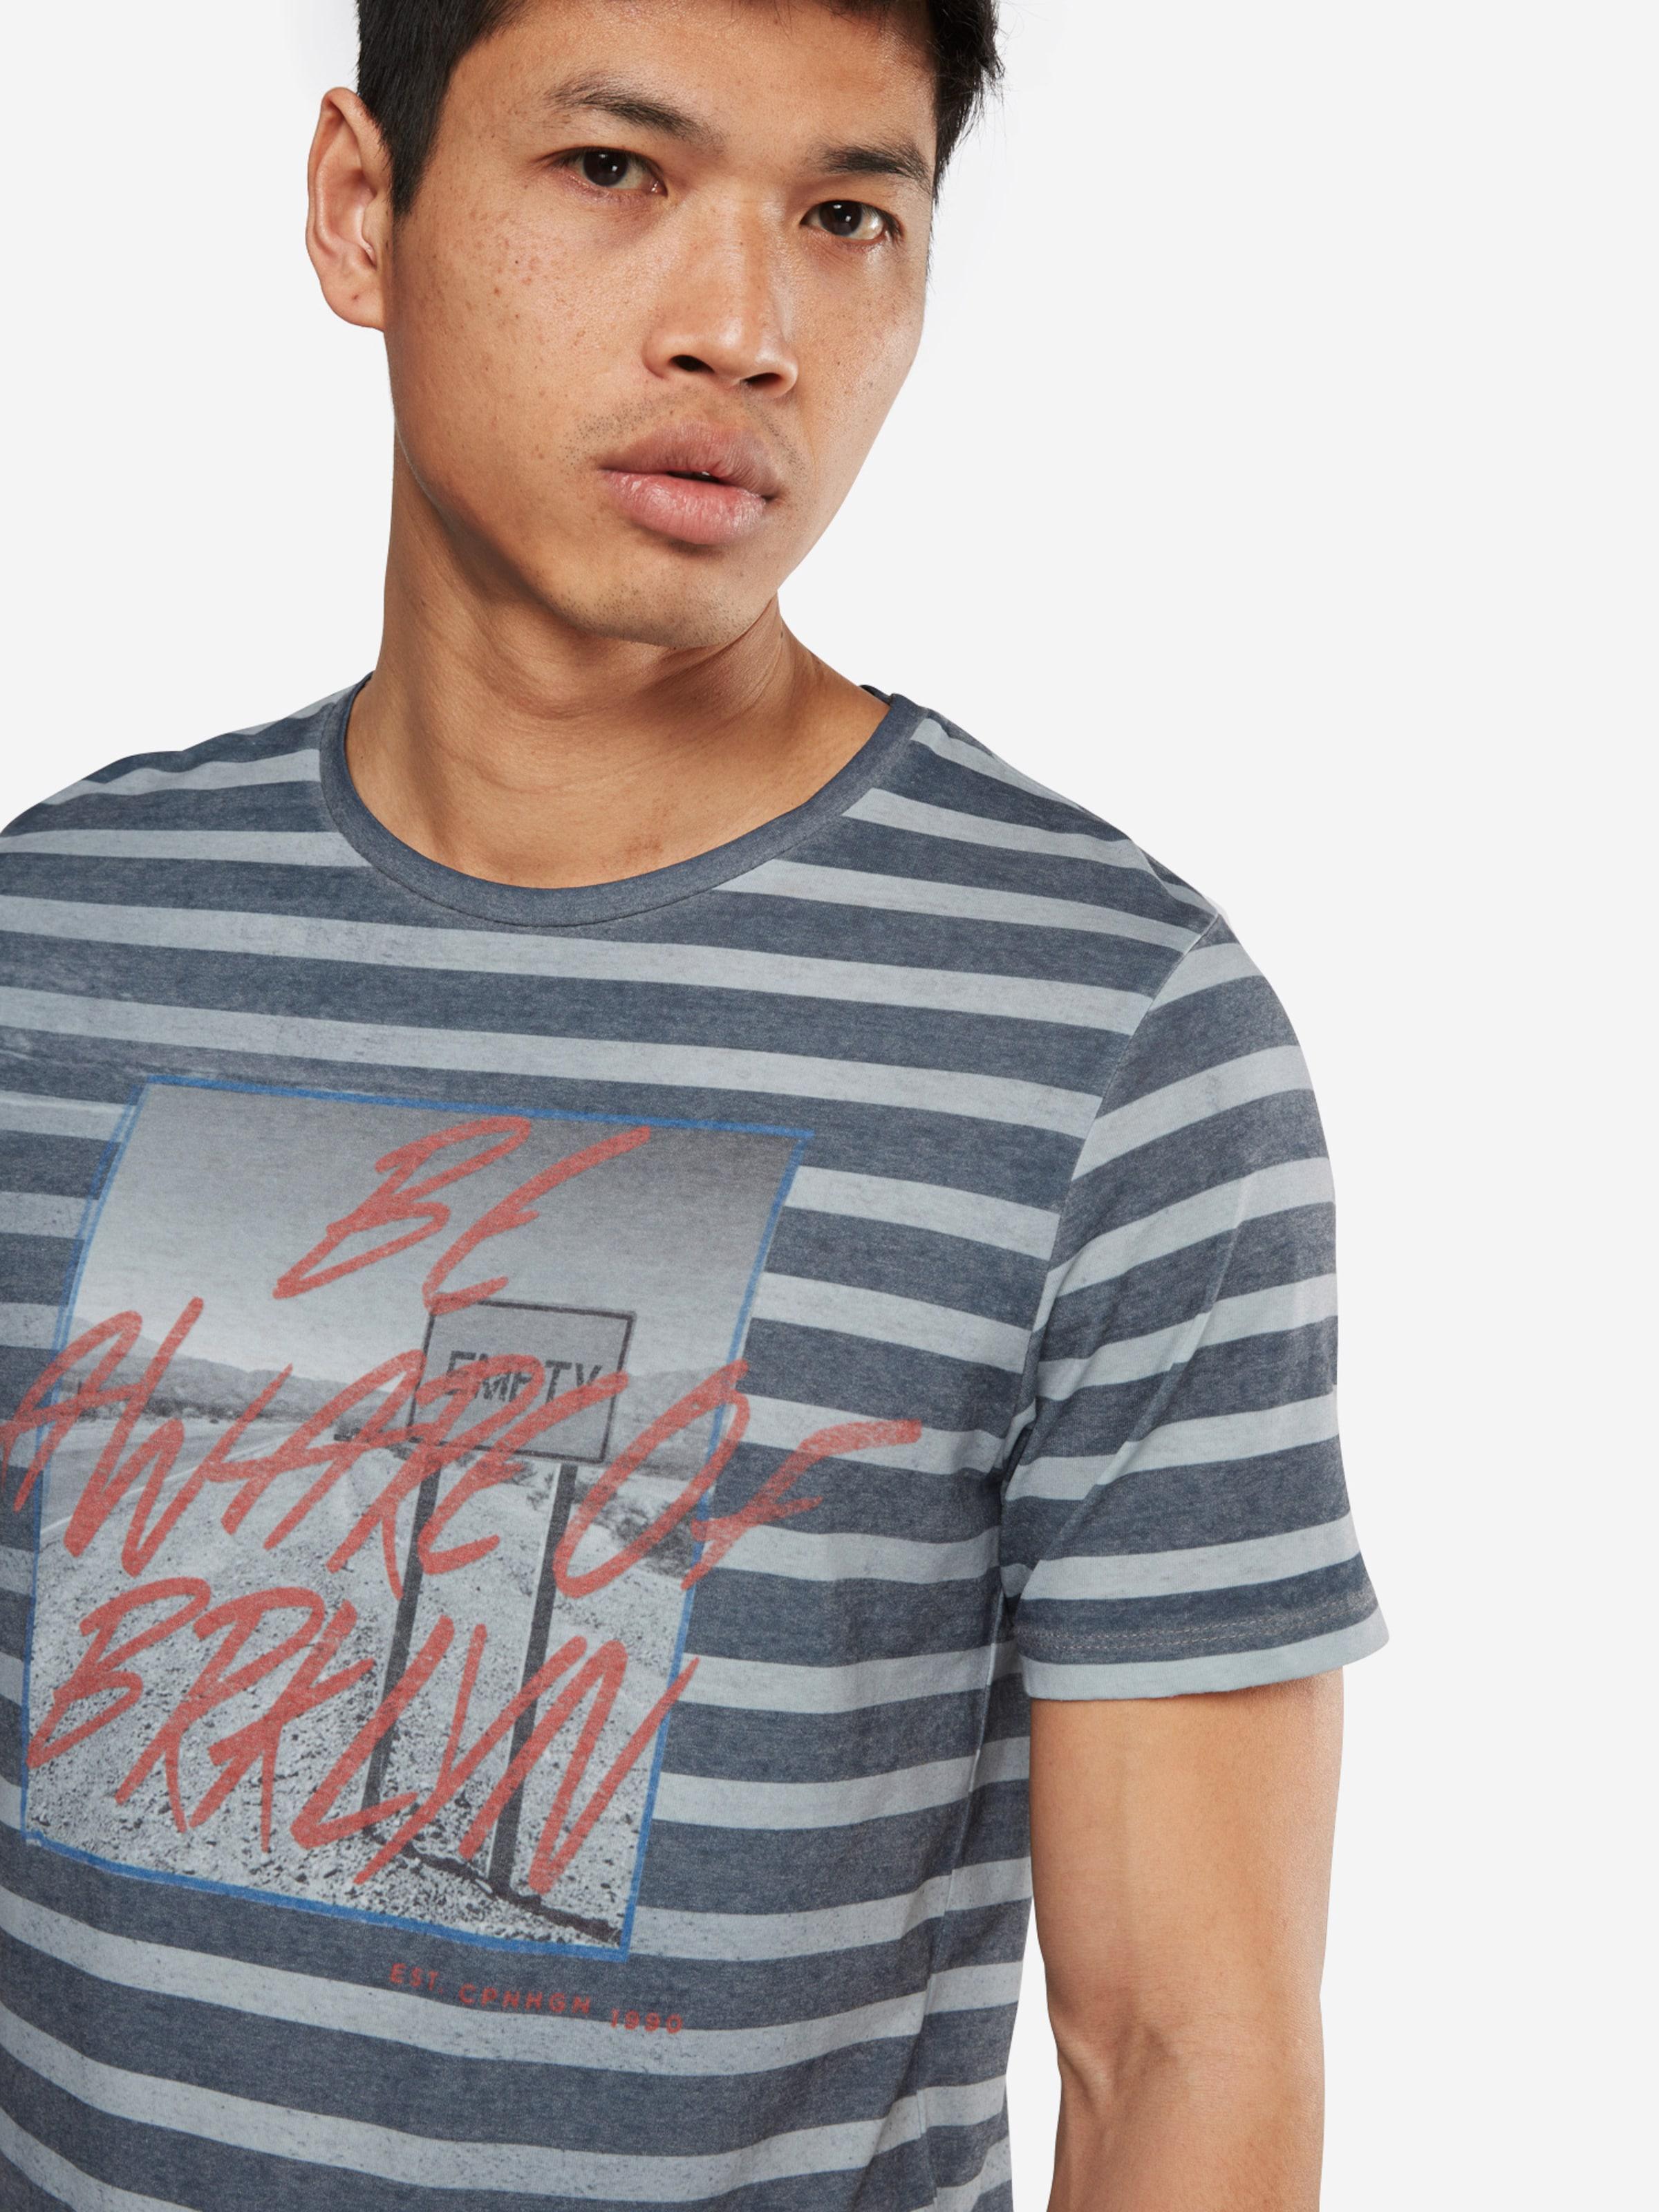 JACK & JONES T-Shirt 'JORSUNDOWN STRIPE SS CREW NECK' Verkauf Sast 1VmJDj8l